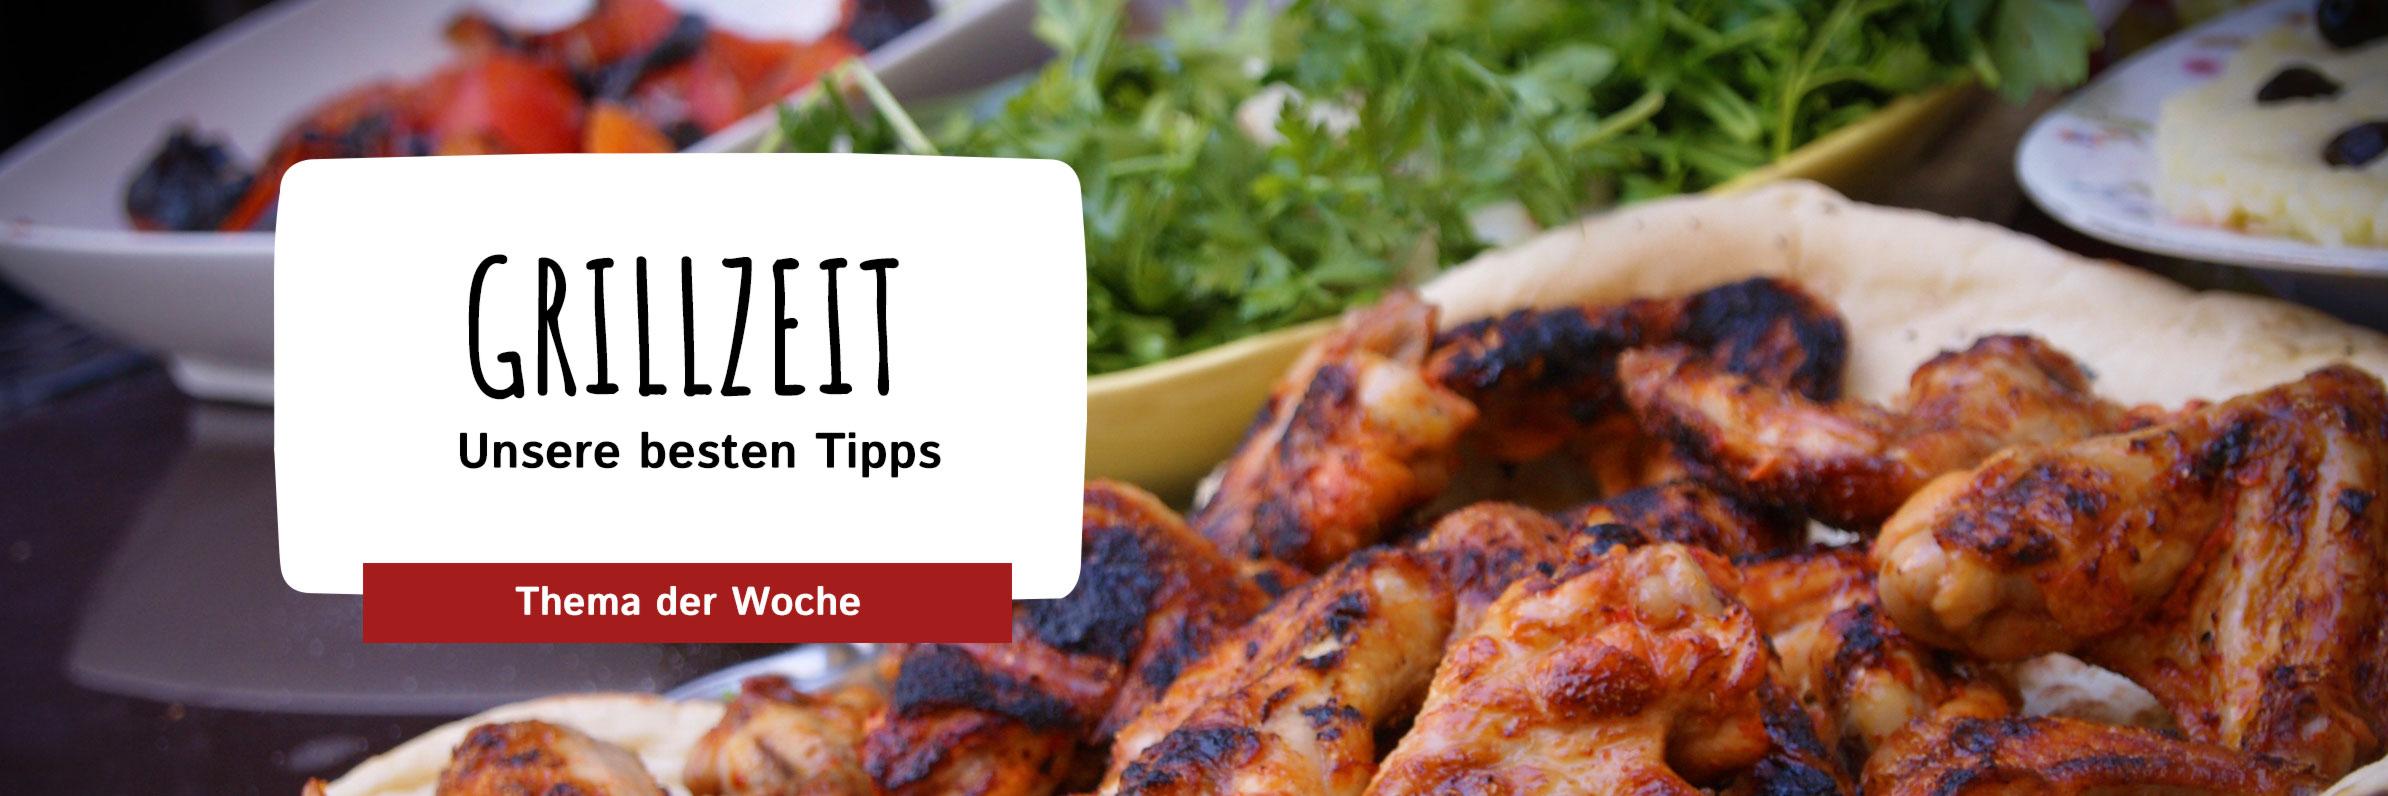 Grillen: Rezepte & Tipps